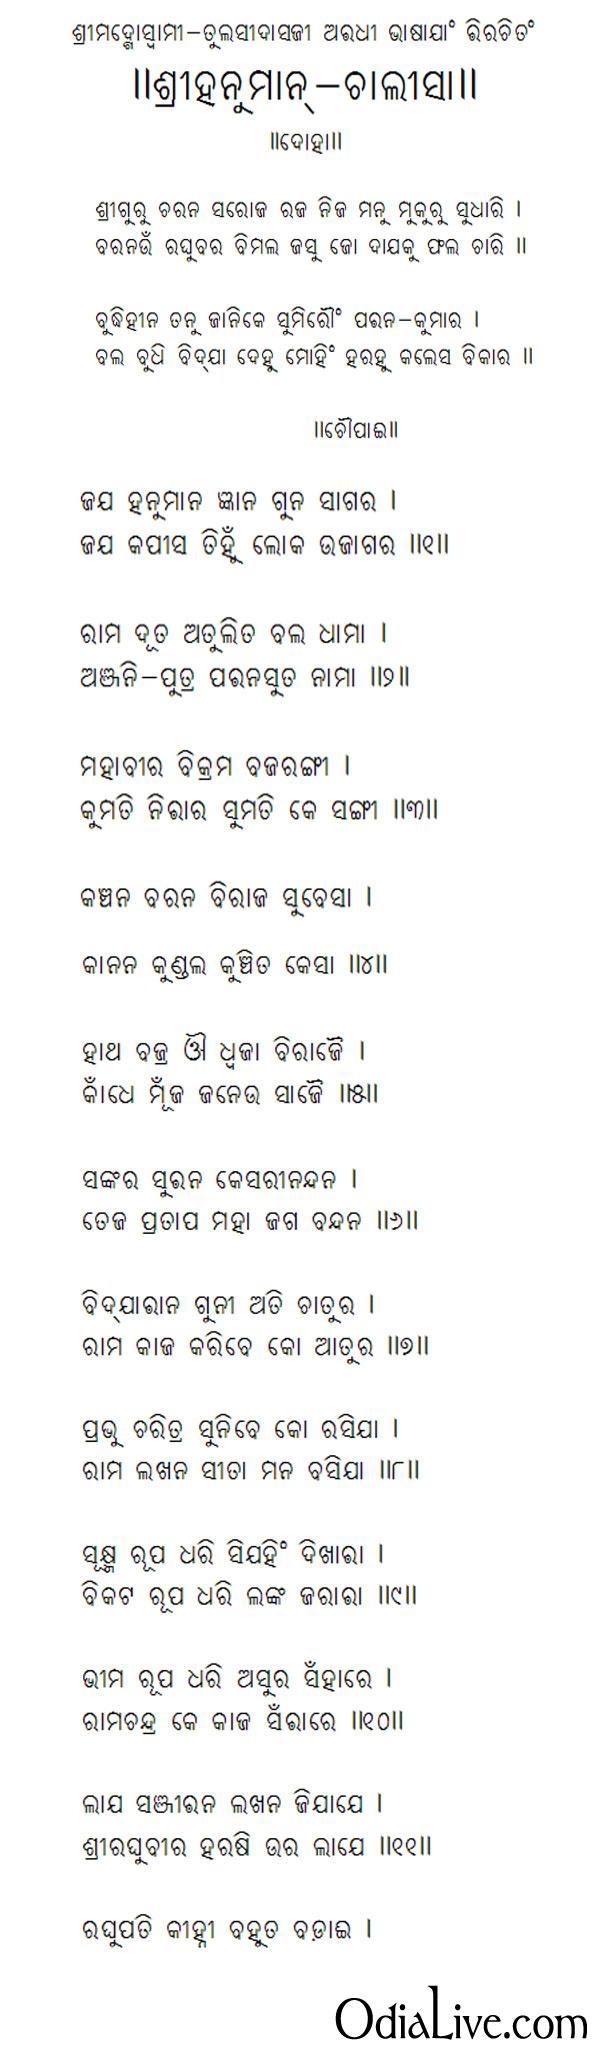 hanuman-chalisa-odia-bhajan-1